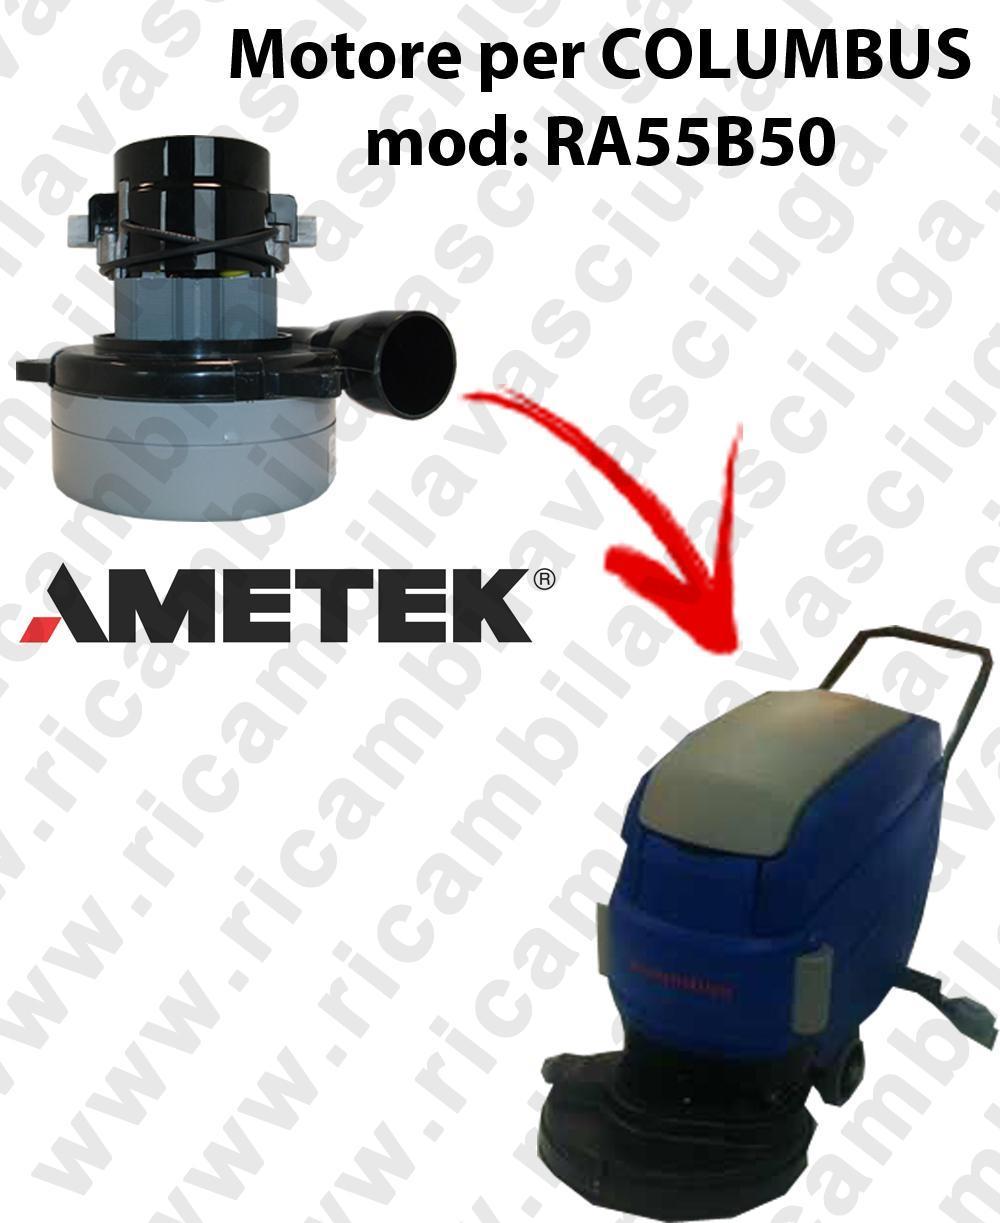 RA55B50 Motore de aspiración LAMB AMETEK para fregadora COLUMBUS